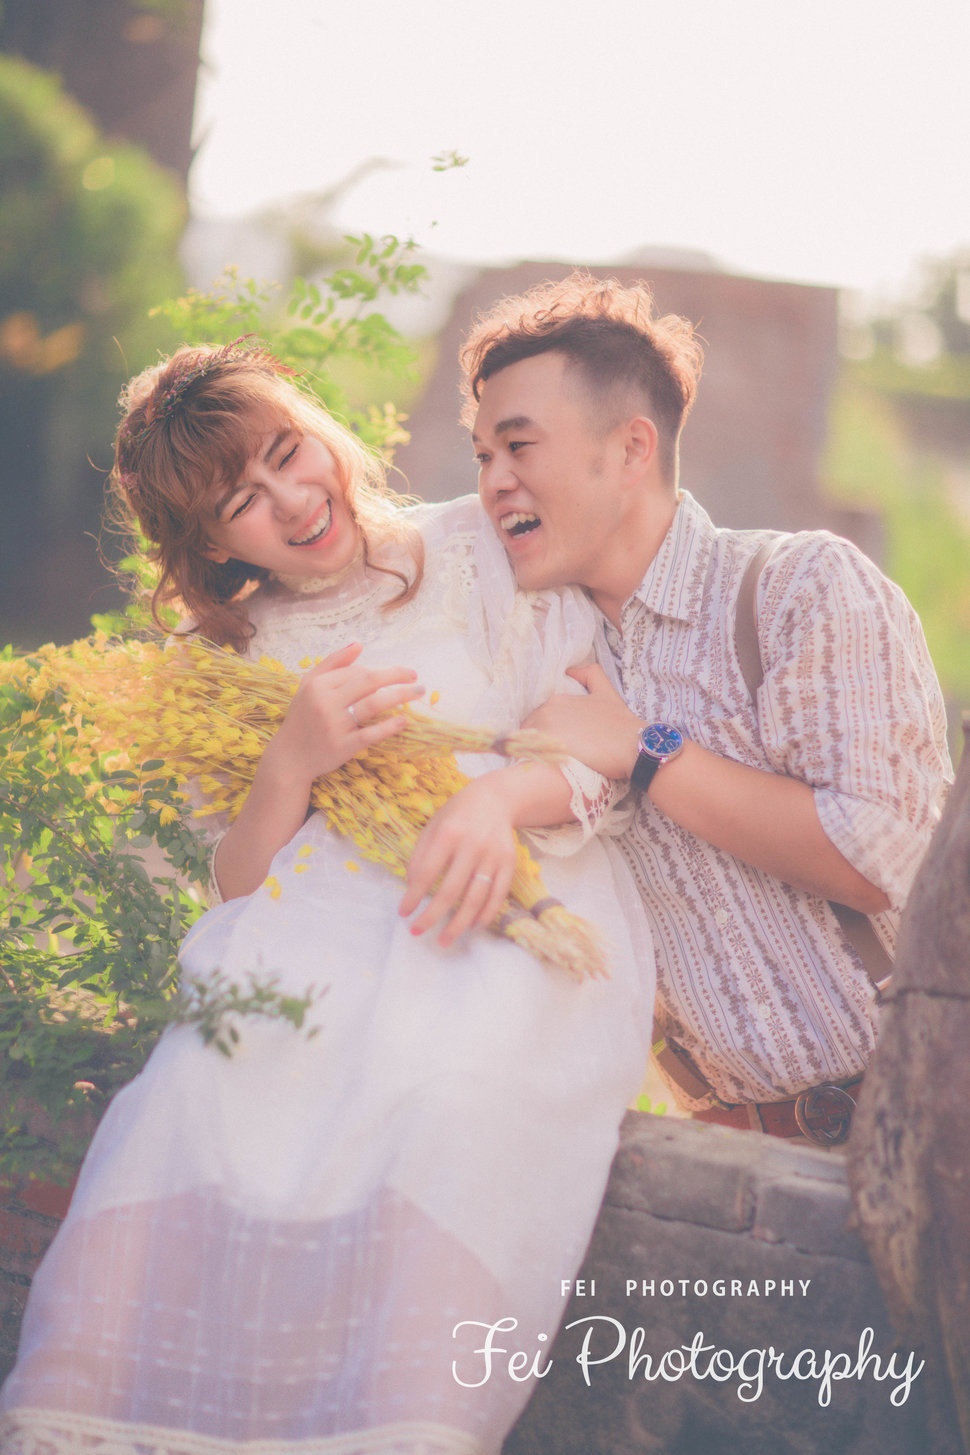 26 - 飛妃 Photography/女攝影師《結婚吧》